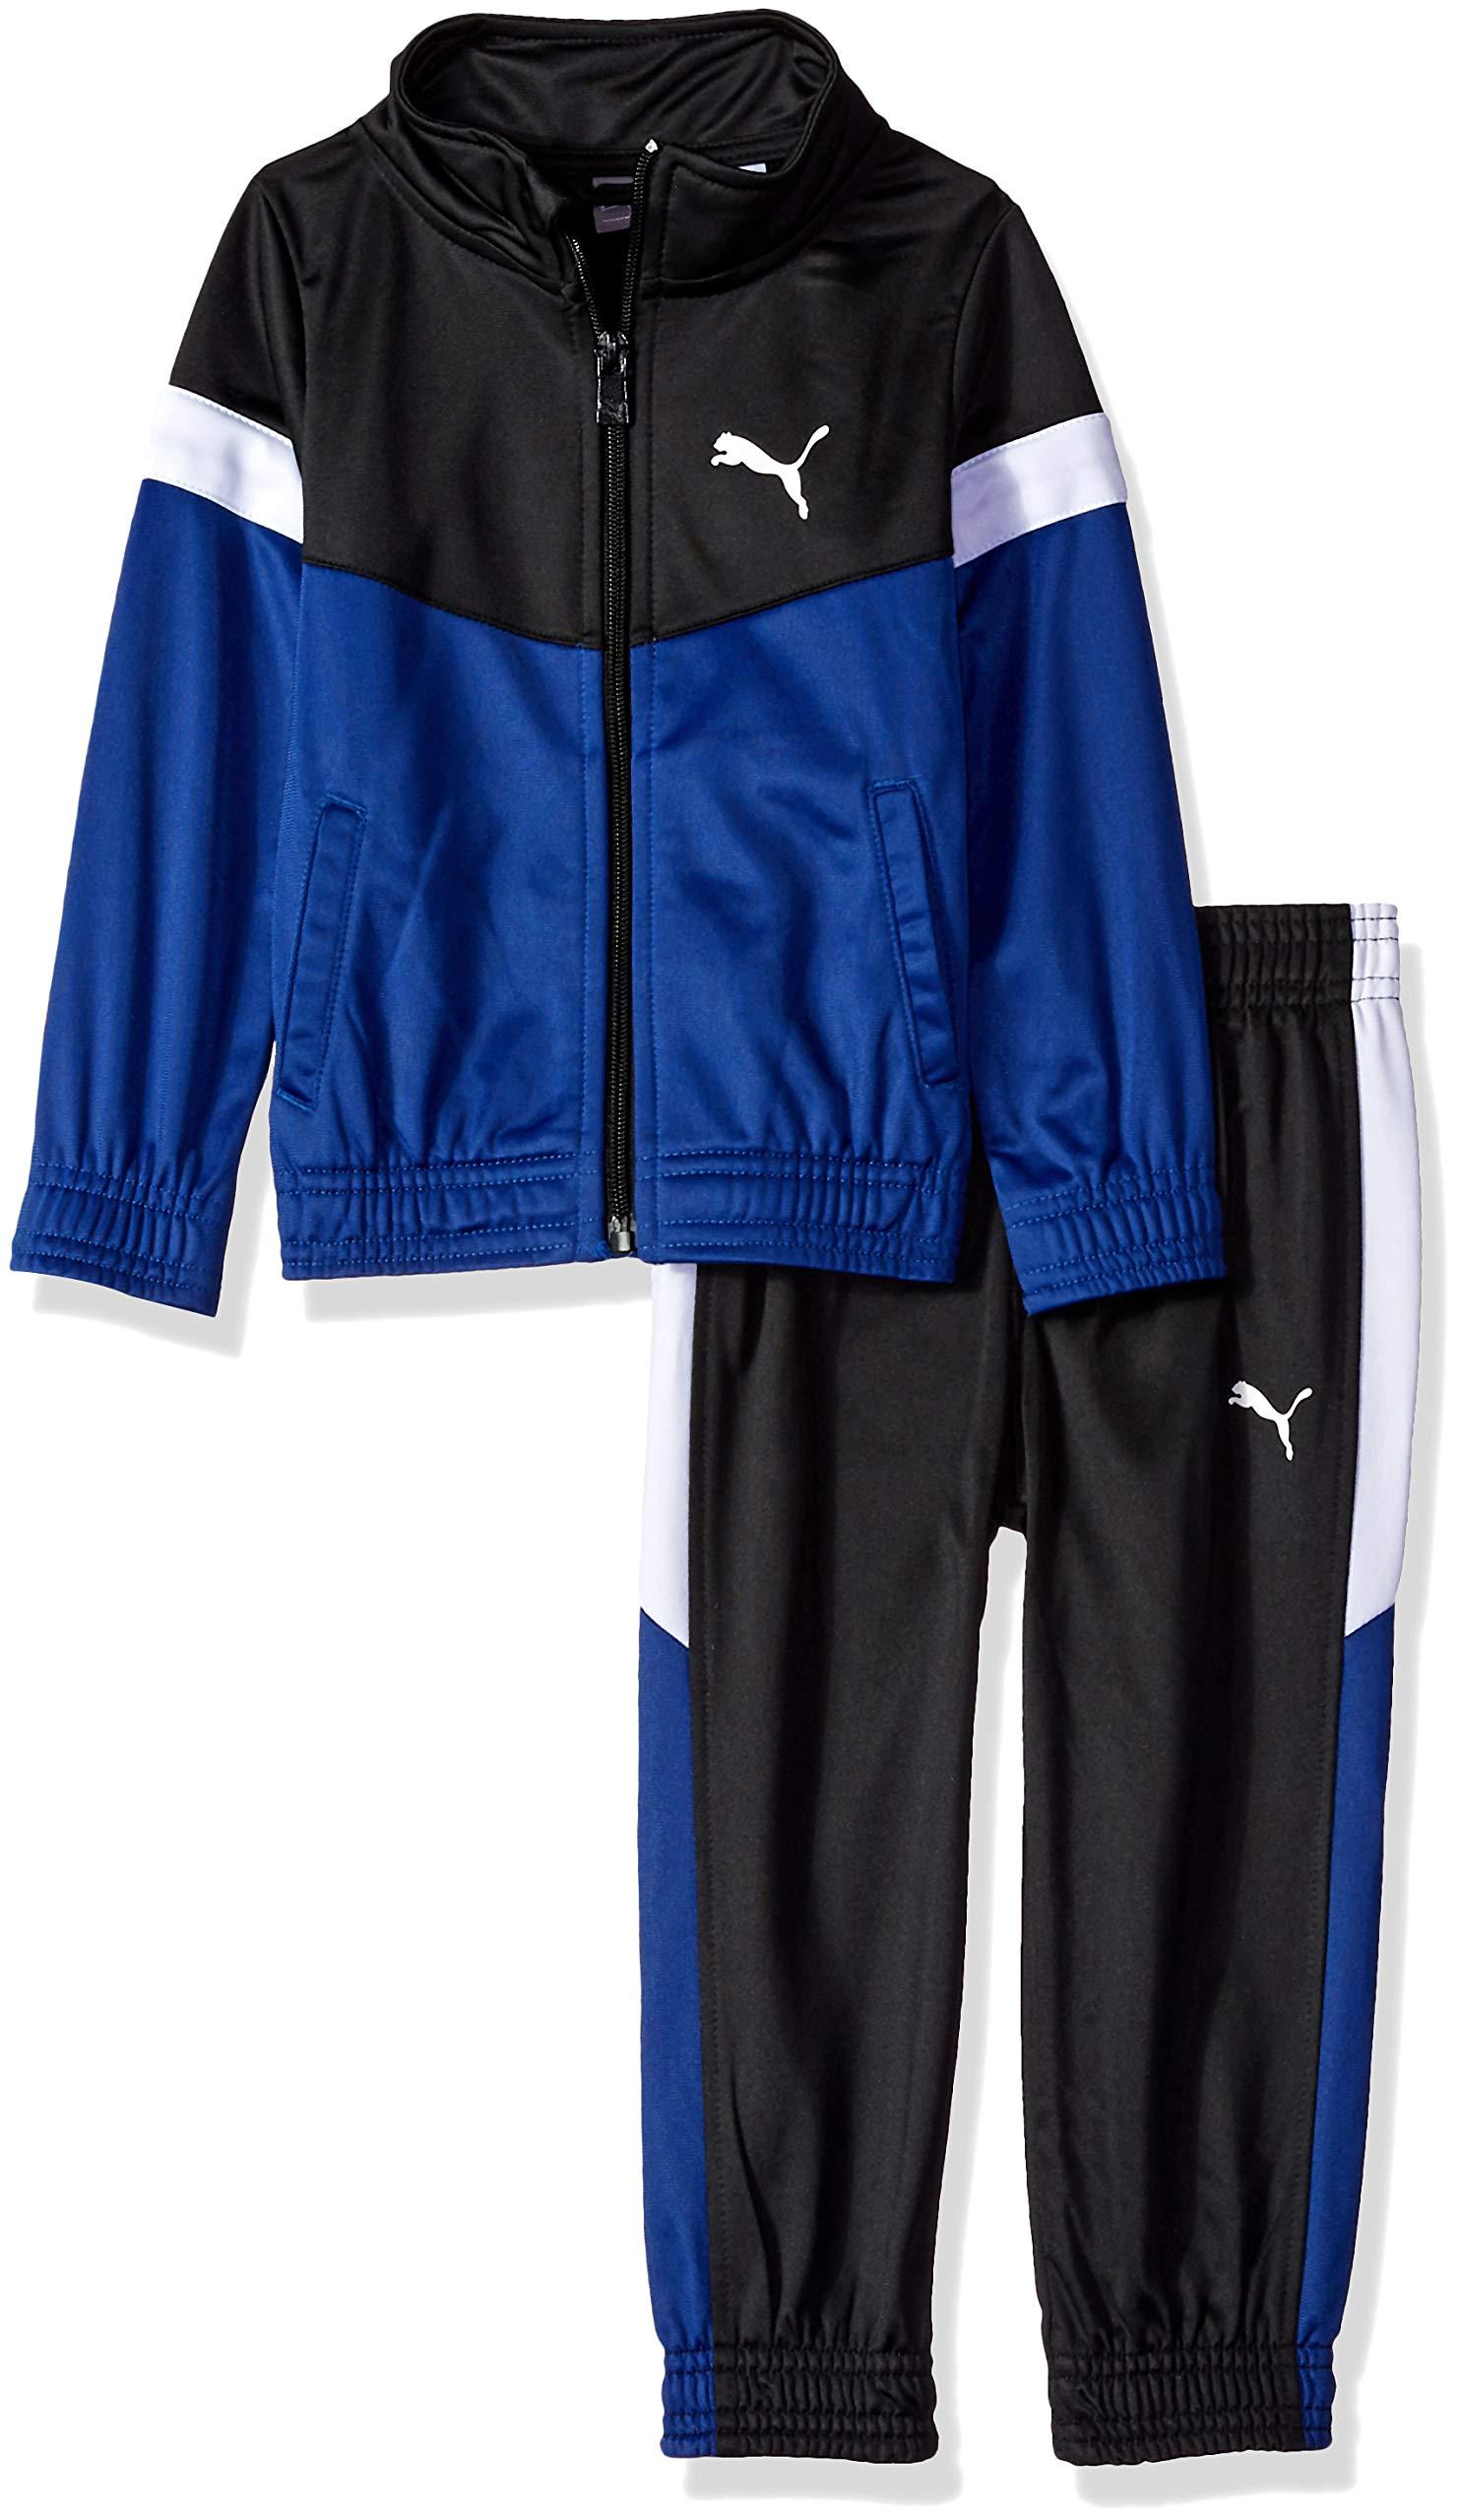 PUMA Toddler Boys' Tricot Pant Set, Sodalite Blue, 4T